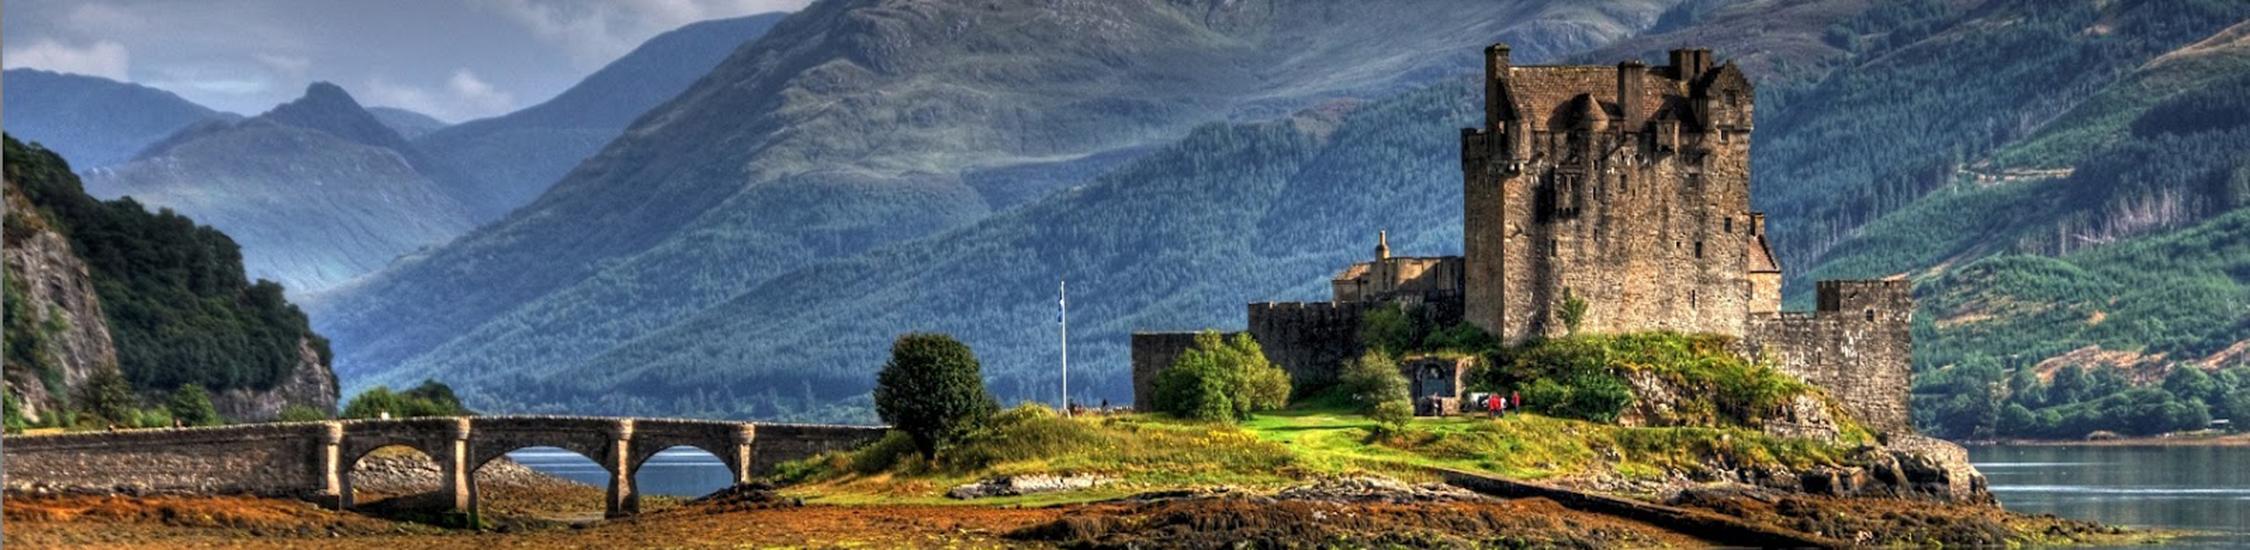 stock photo of Scotland